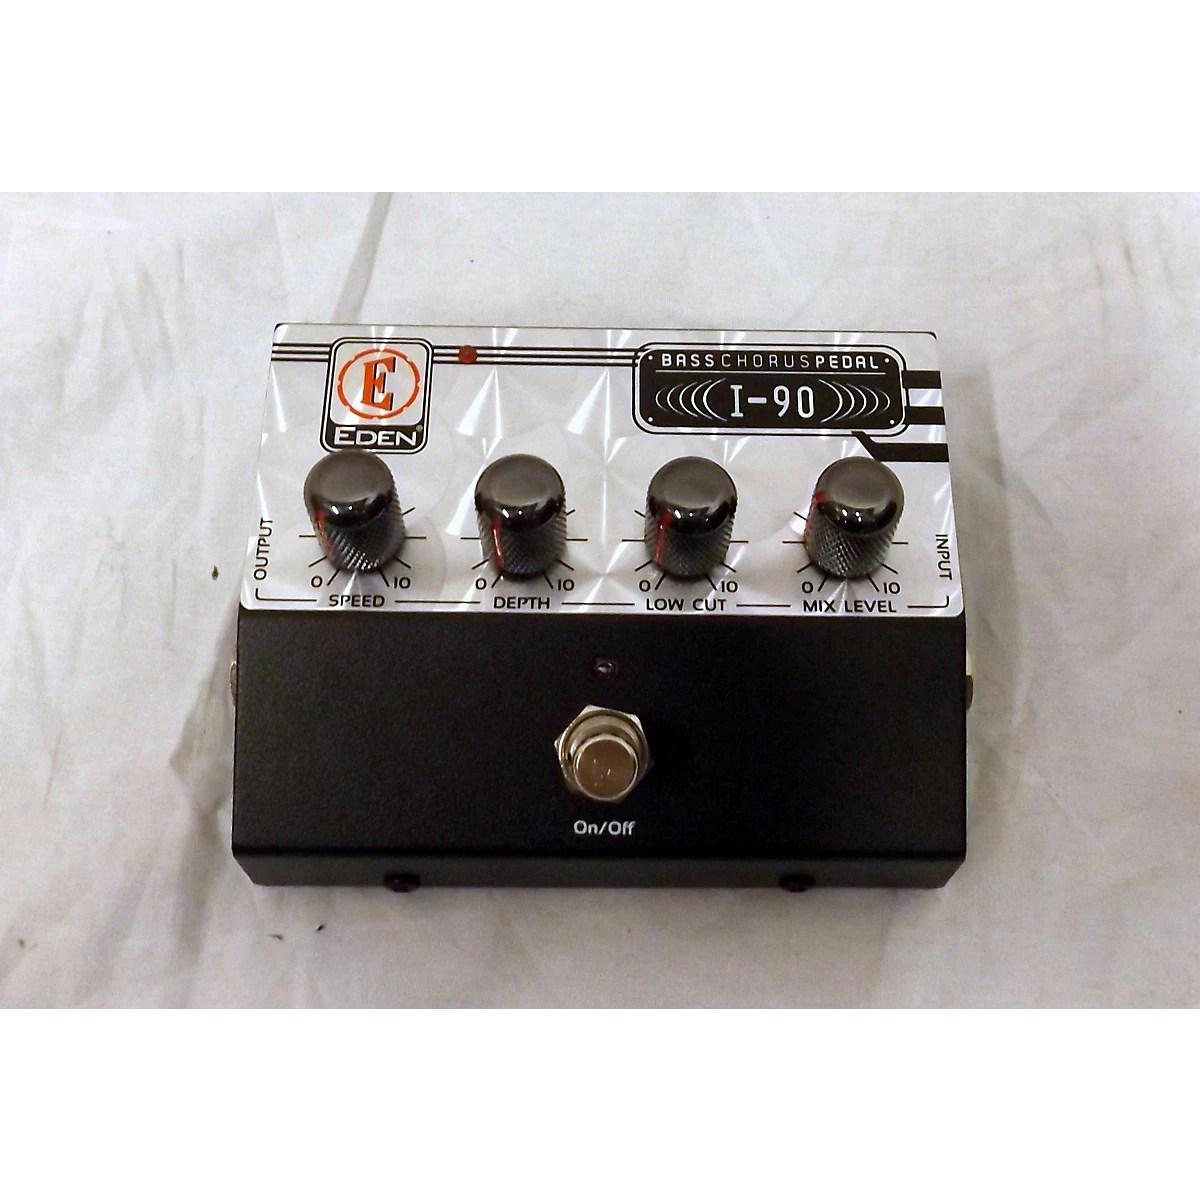 Used Eden PRO BASS CHORUS PEDAL Effect Pedal   Guitar Center